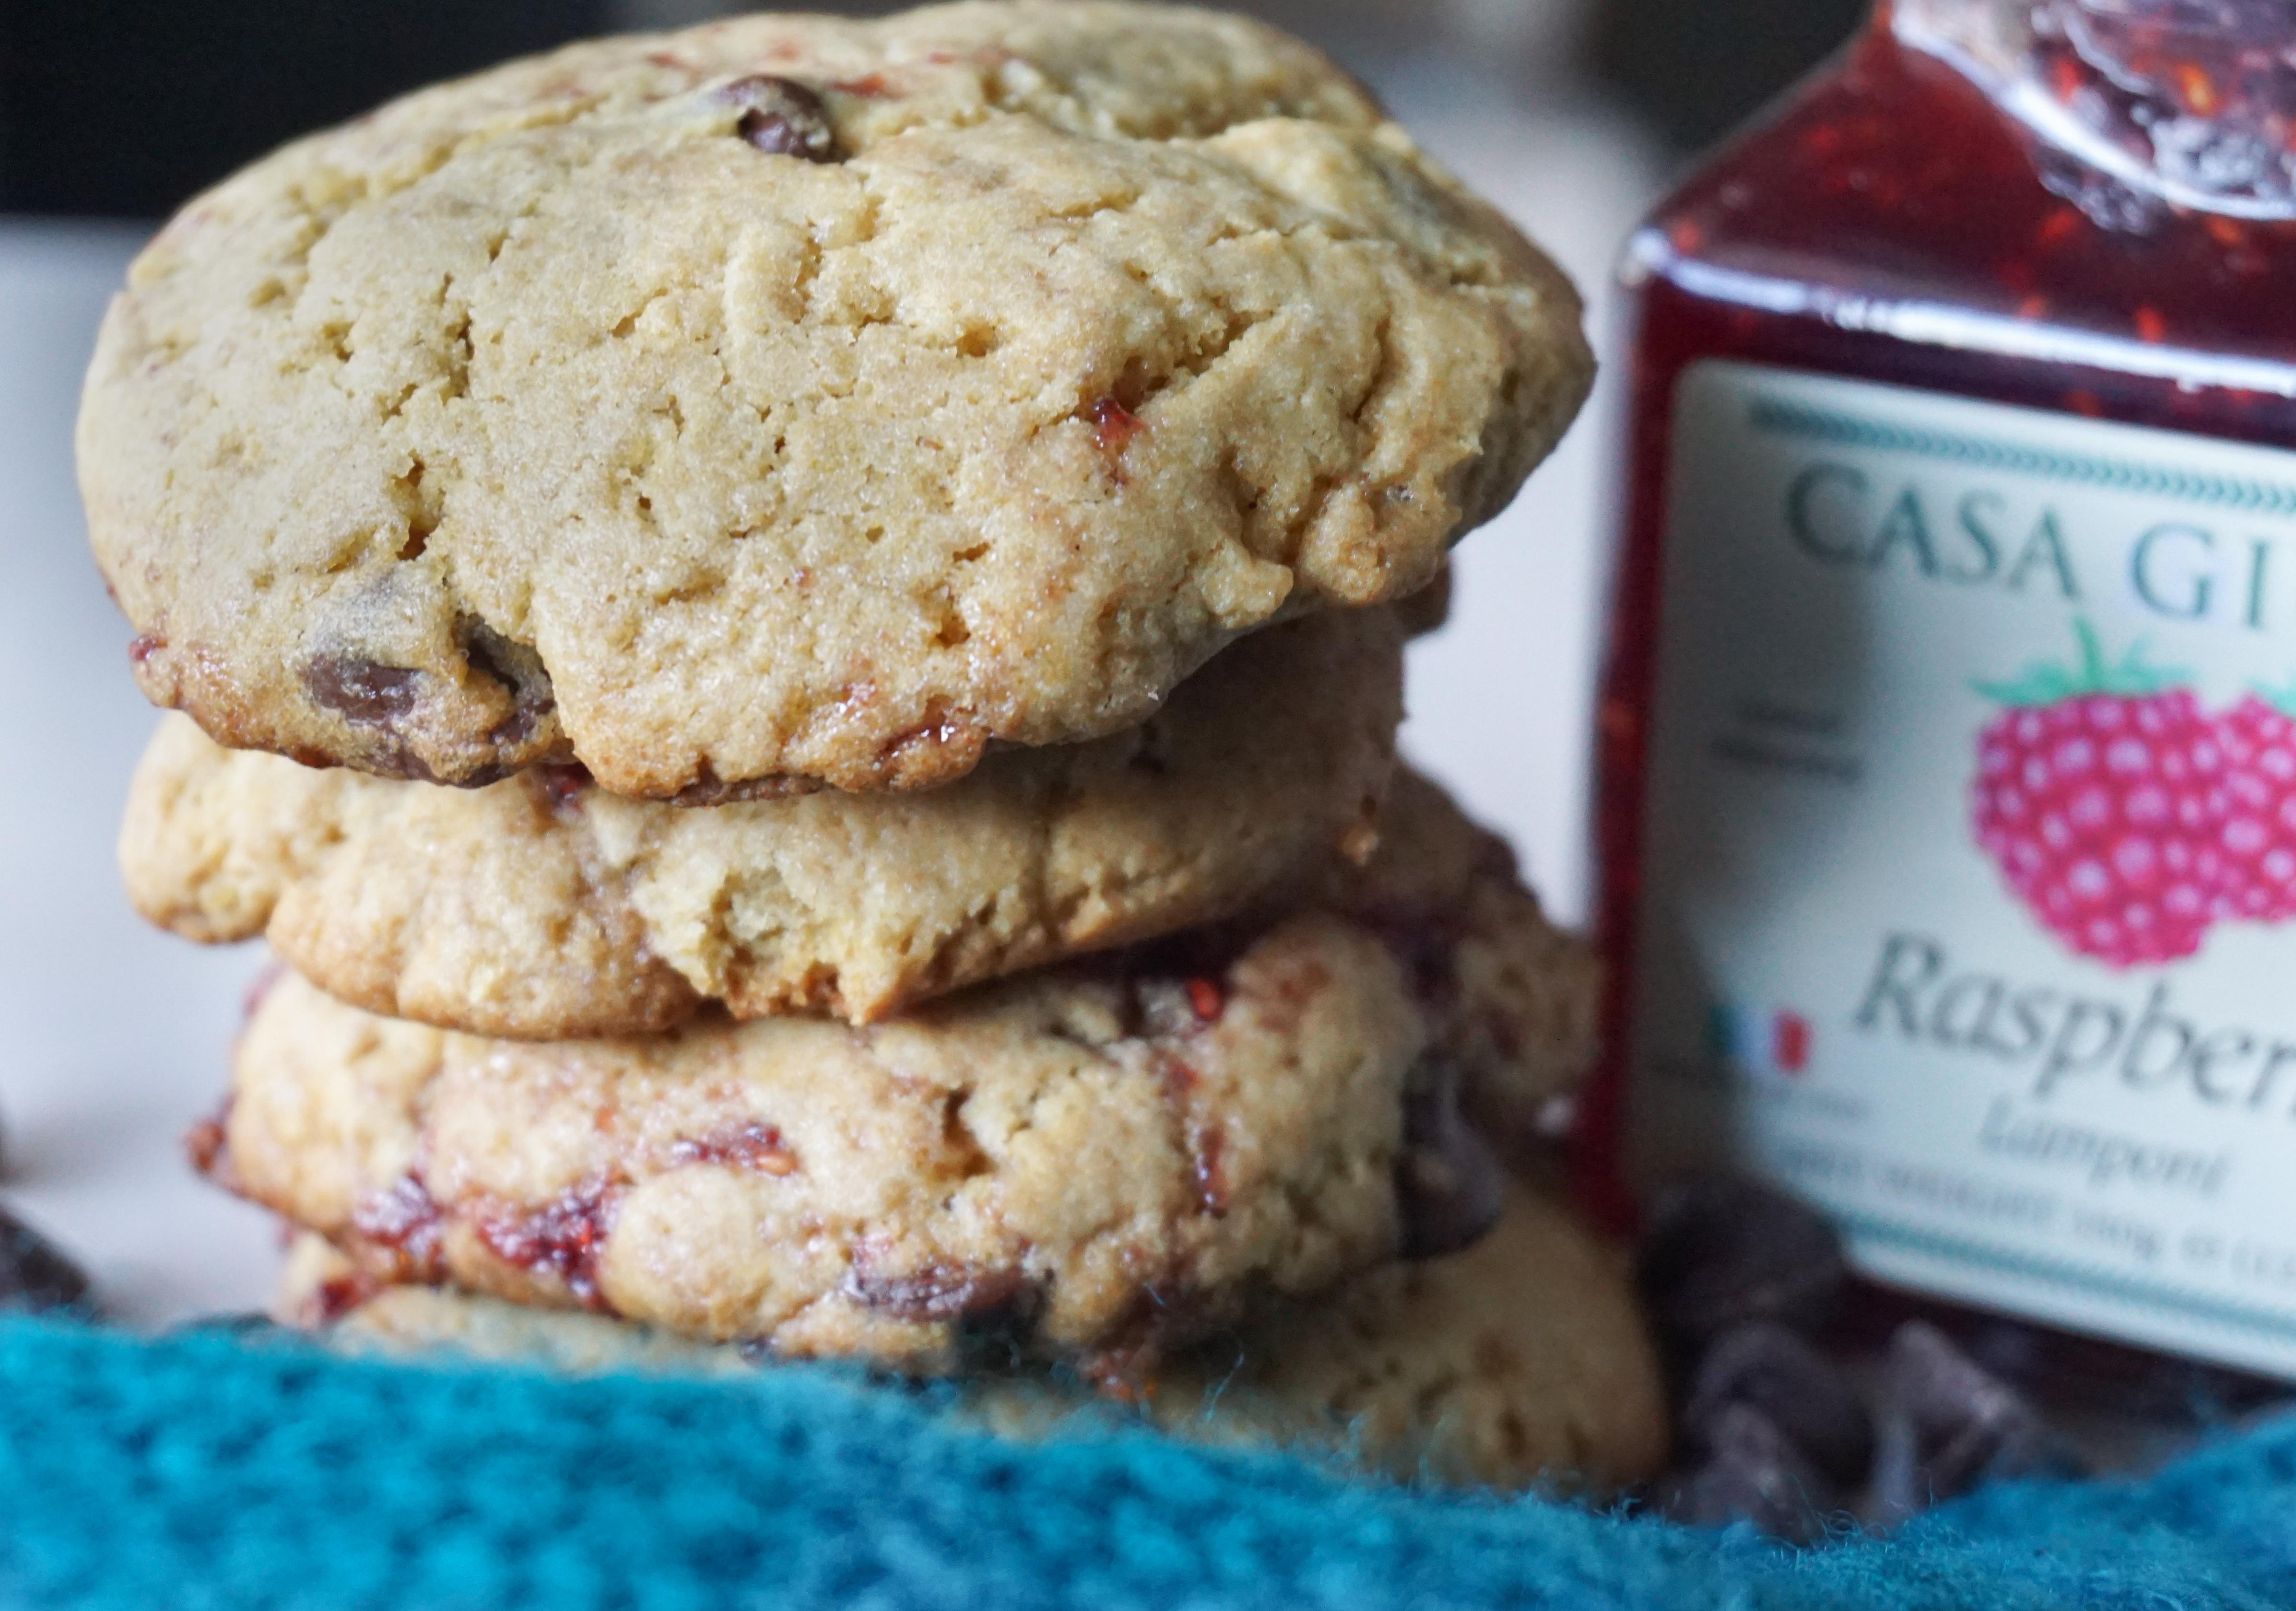 Raspberry Chocolate Chip Whole Wheat Cookies